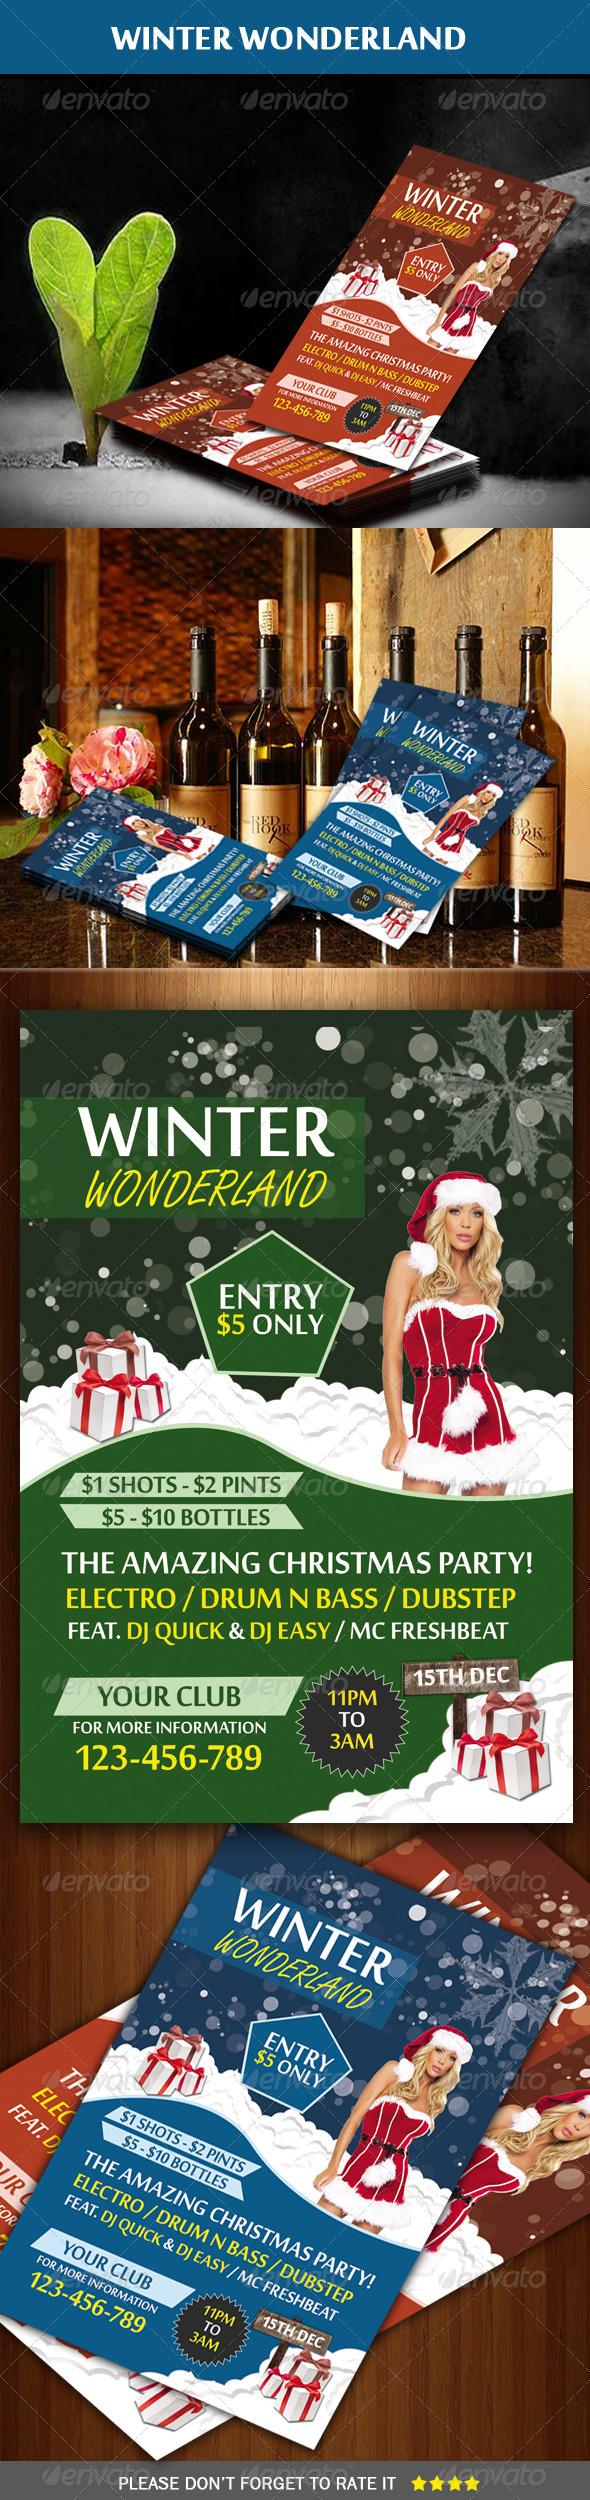 GraphicRiver Winter Wonderland Party Flyer 5965164